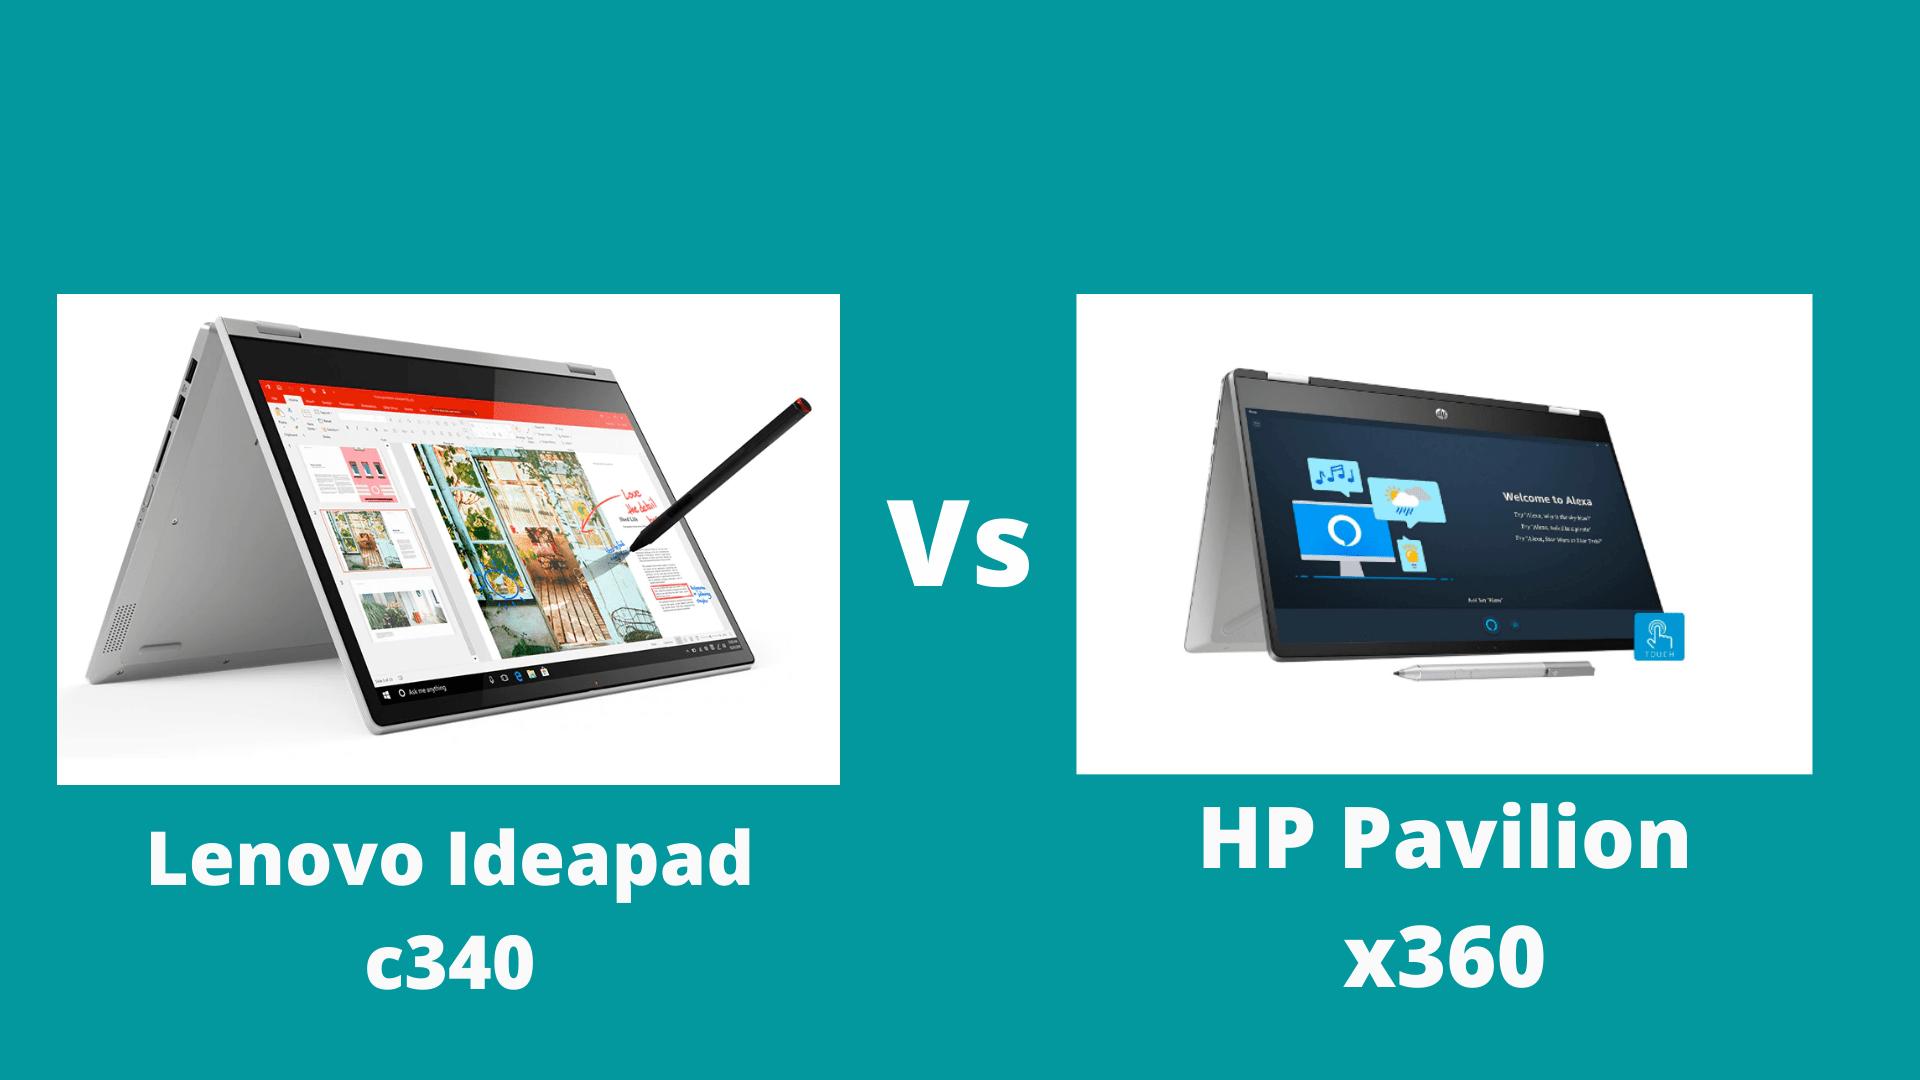 Hp Pavilion X360 Vs Lenovo Ideapad C340 2020 Electronicspheres